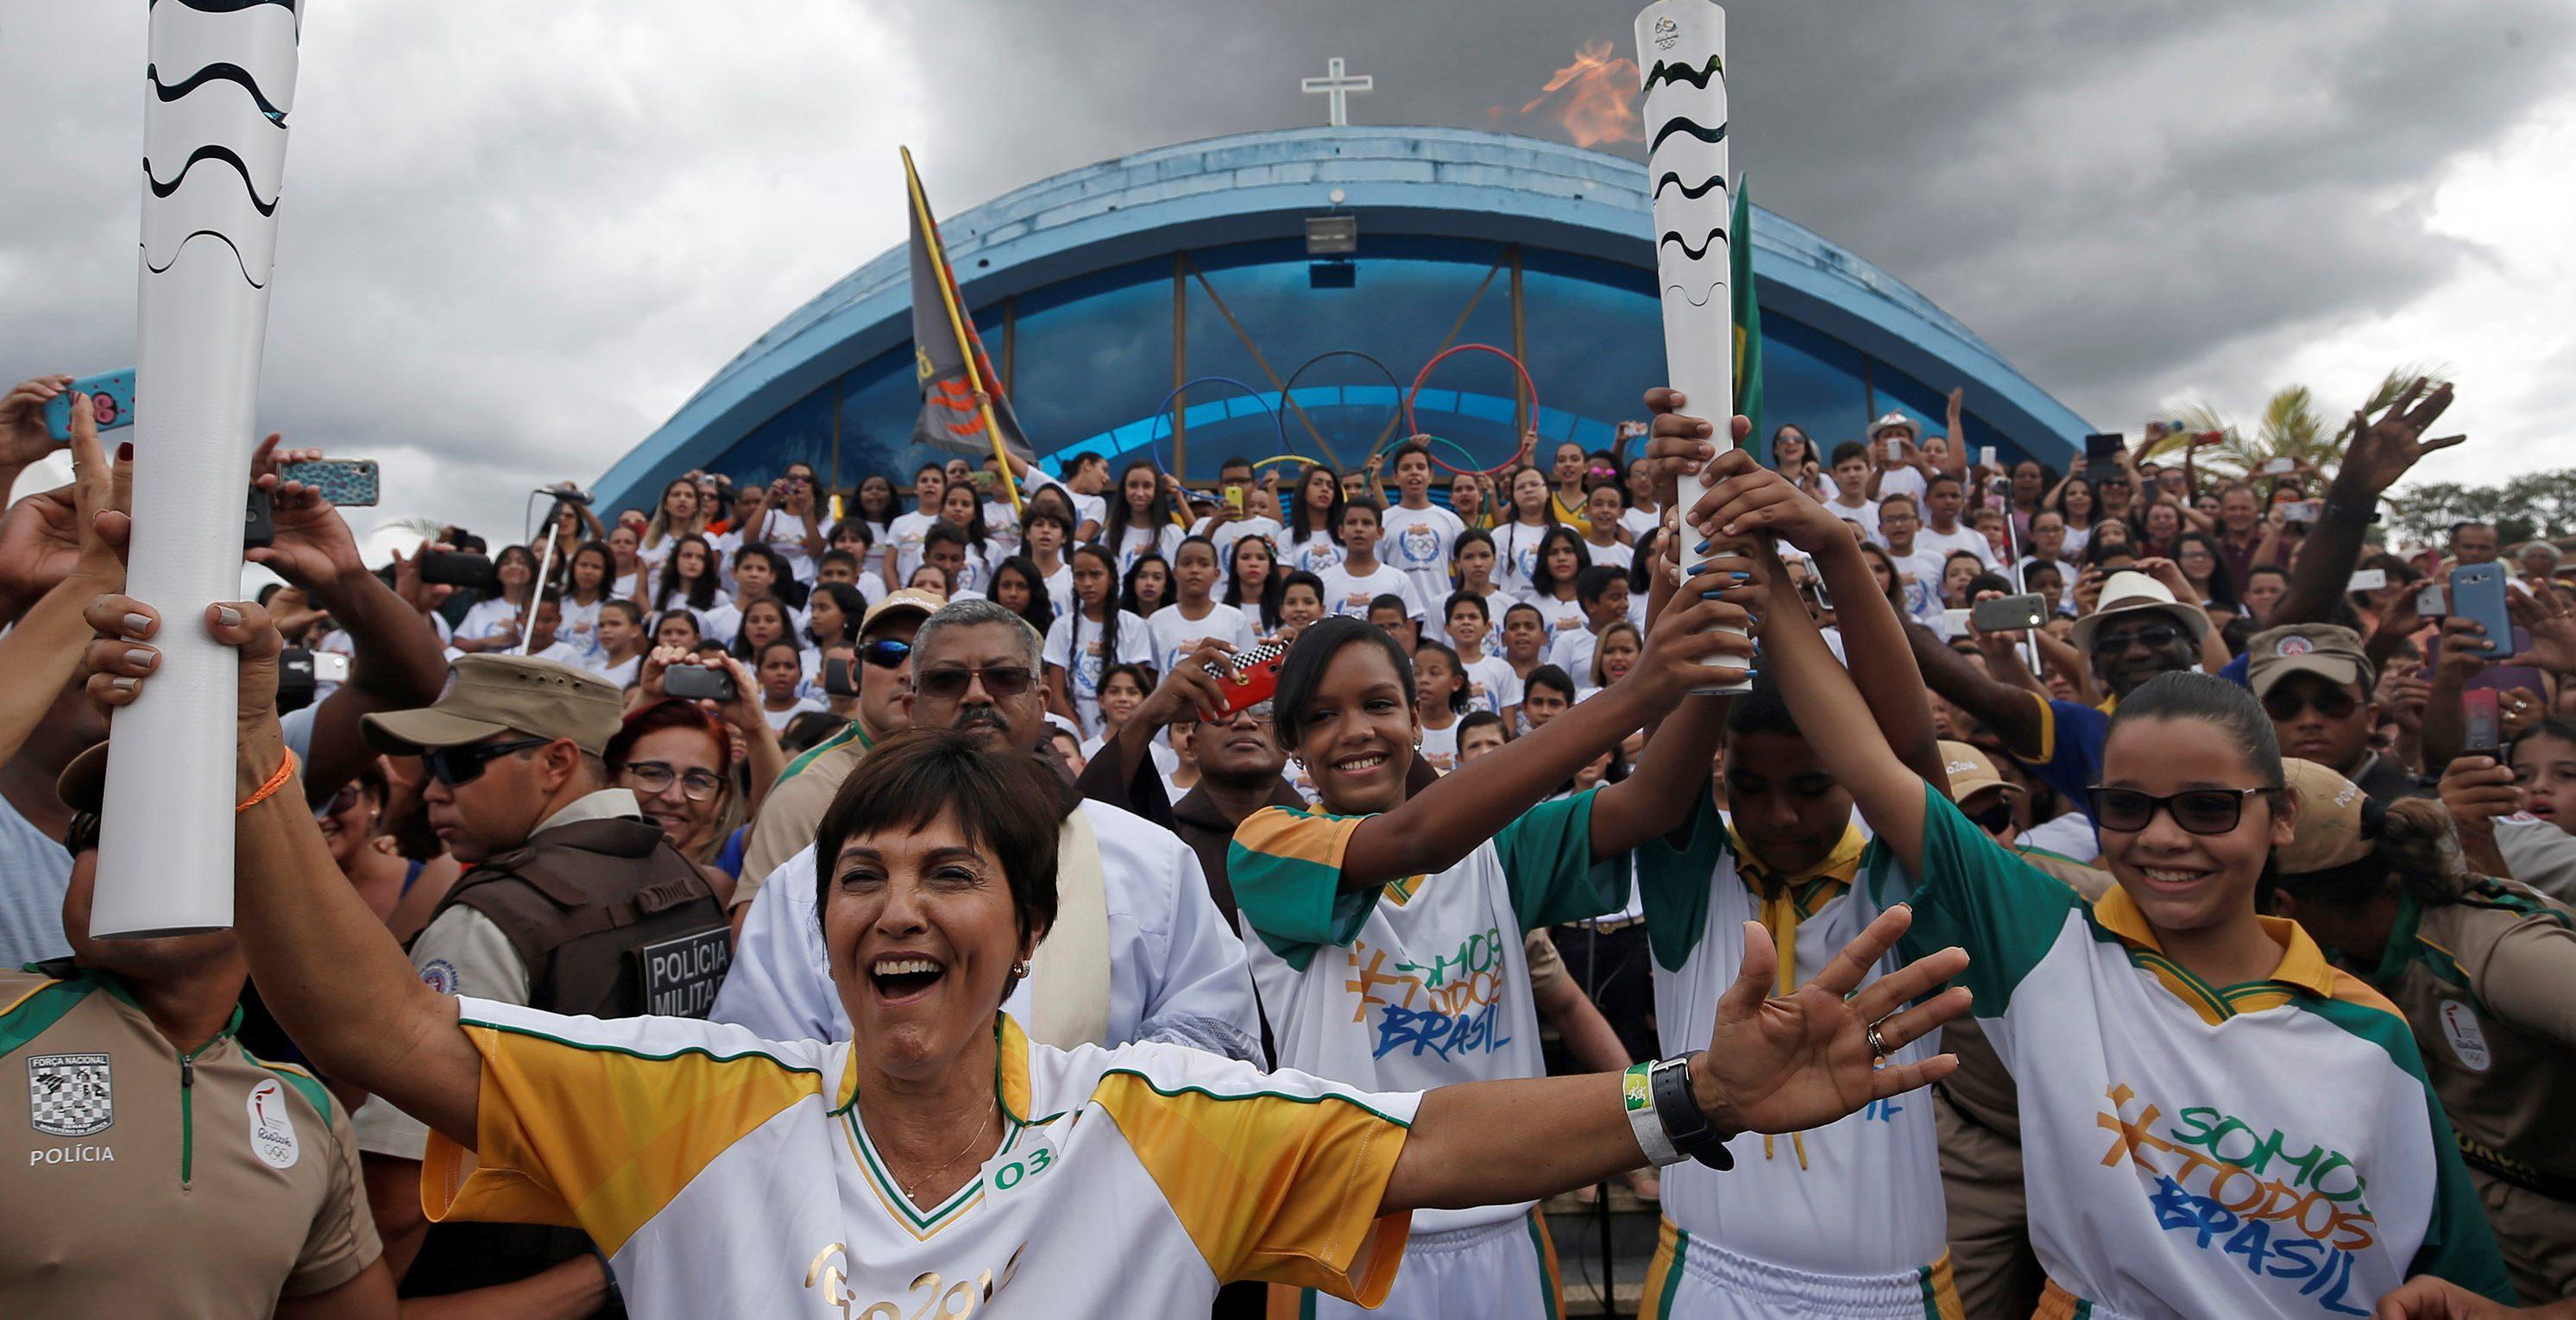 Resident Maria da Gloria takes part in the Olympic Flame torch relay in Itamaraju, Bahia state, Brazil